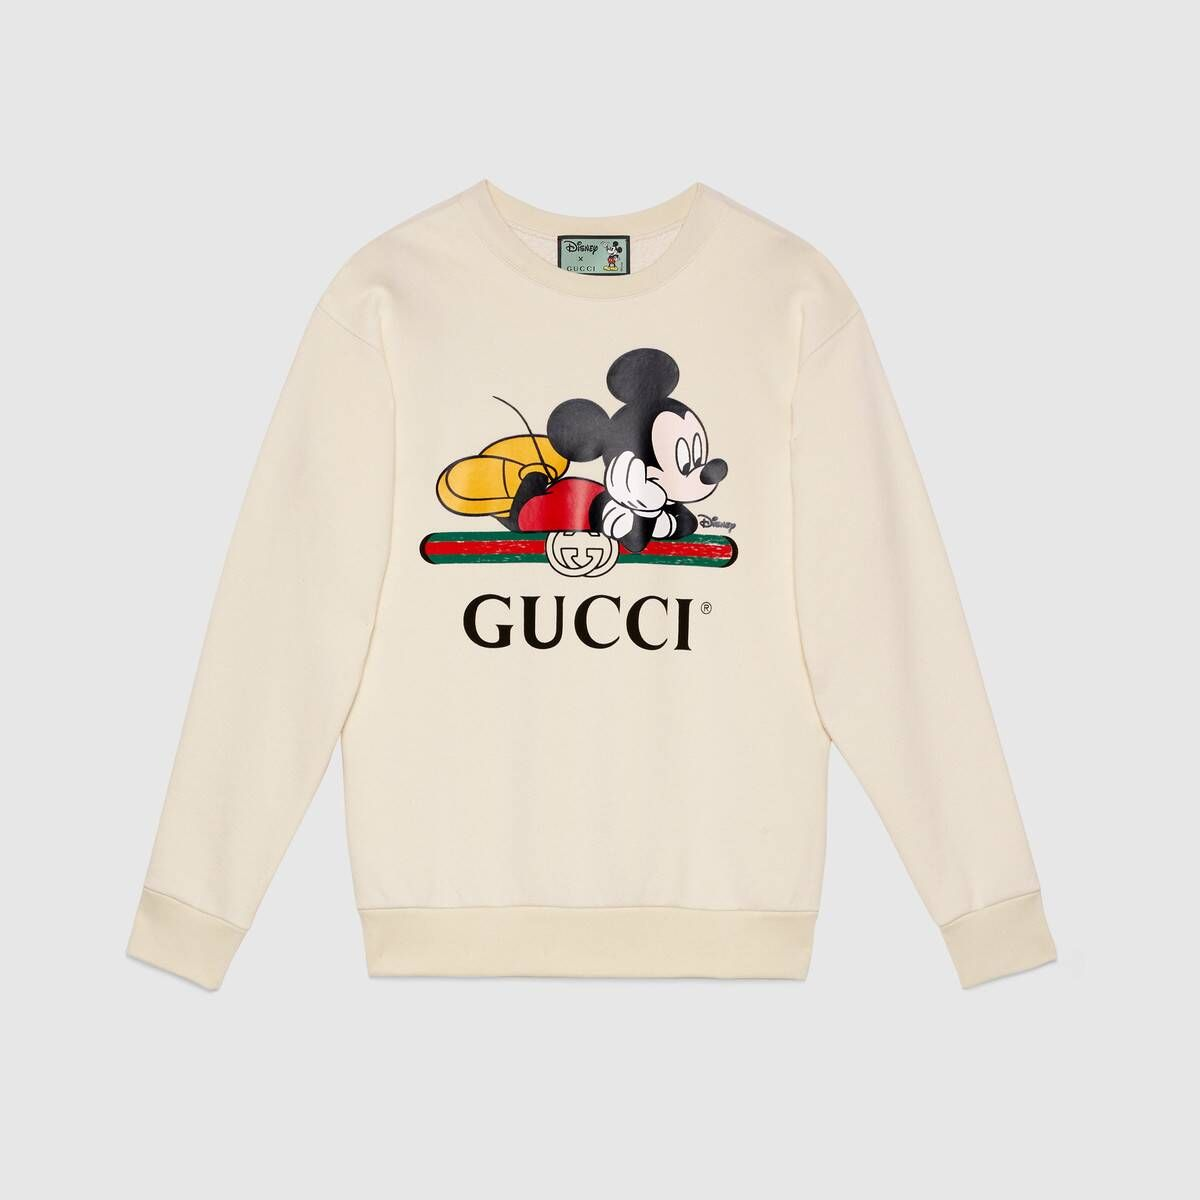 Shop The Disney X Gucci Oversize Sweatshirt In White At Gucci Com Enjoy Free Shipping And Complimentary Gift Sweatshirts Gucci Sweatshirt Oversized Sweatshirt [ 1200 x 1200 Pixel ]